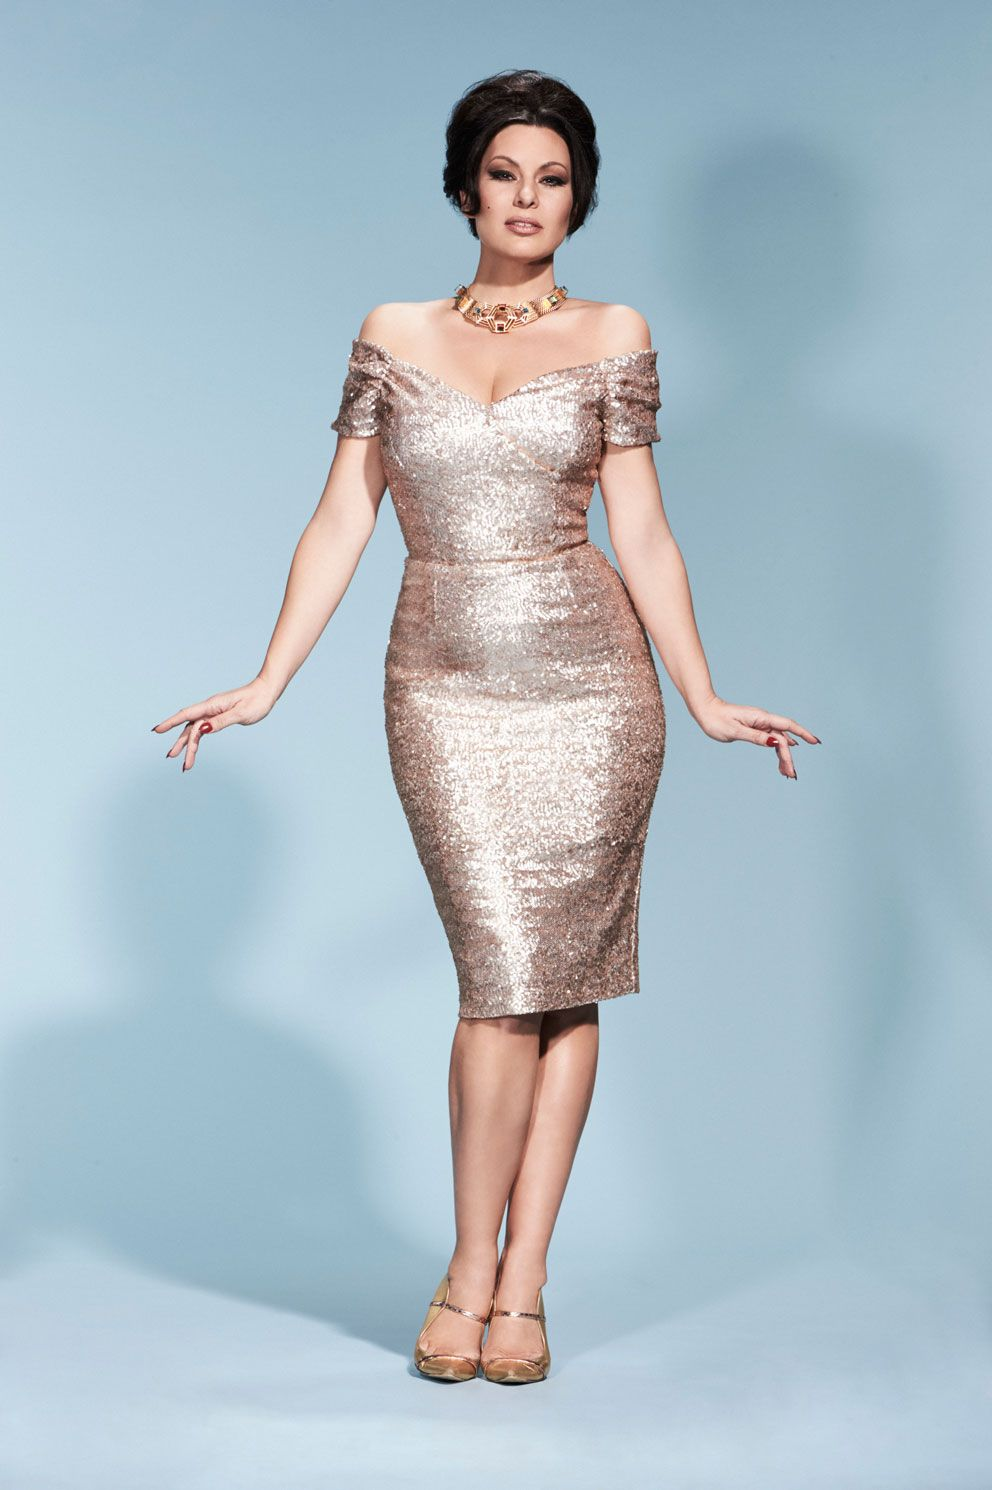 Fatale Pale Gold Sequin Pencil Dress | The Pretty Dress Company ...